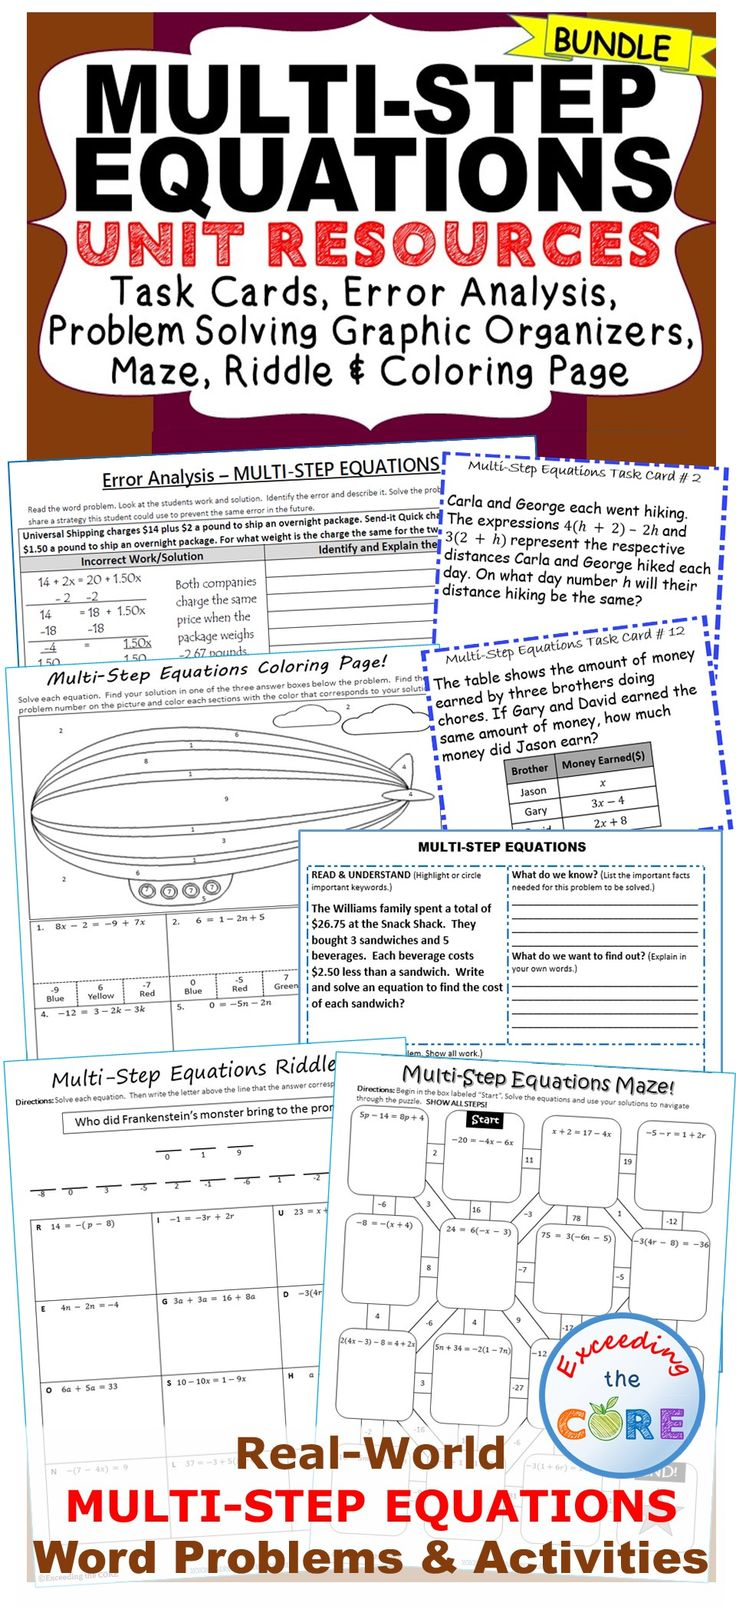 hight resolution of MULTI-STEP EQUATIONS BUNDLE - Task Cards